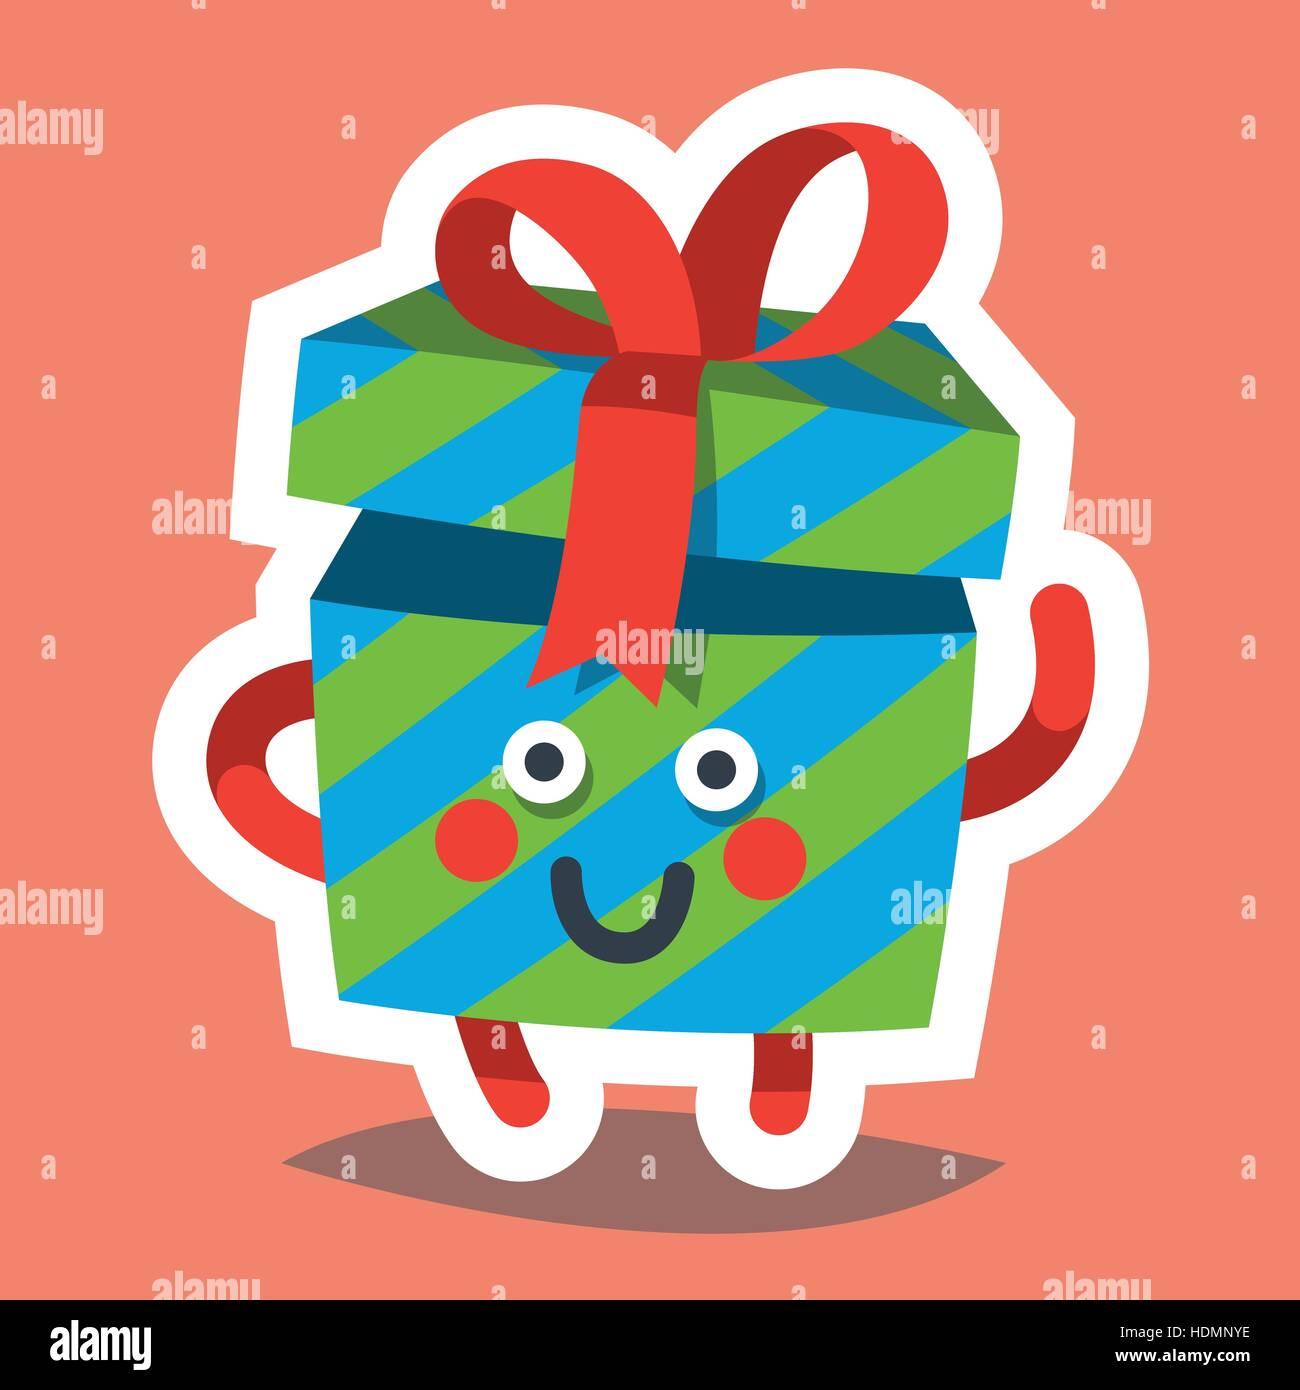 vector illustration emoticon icon on theme of winter holiday emoji emoticon happy new year icon emotion merry christmas funny gift xmas sticker ico